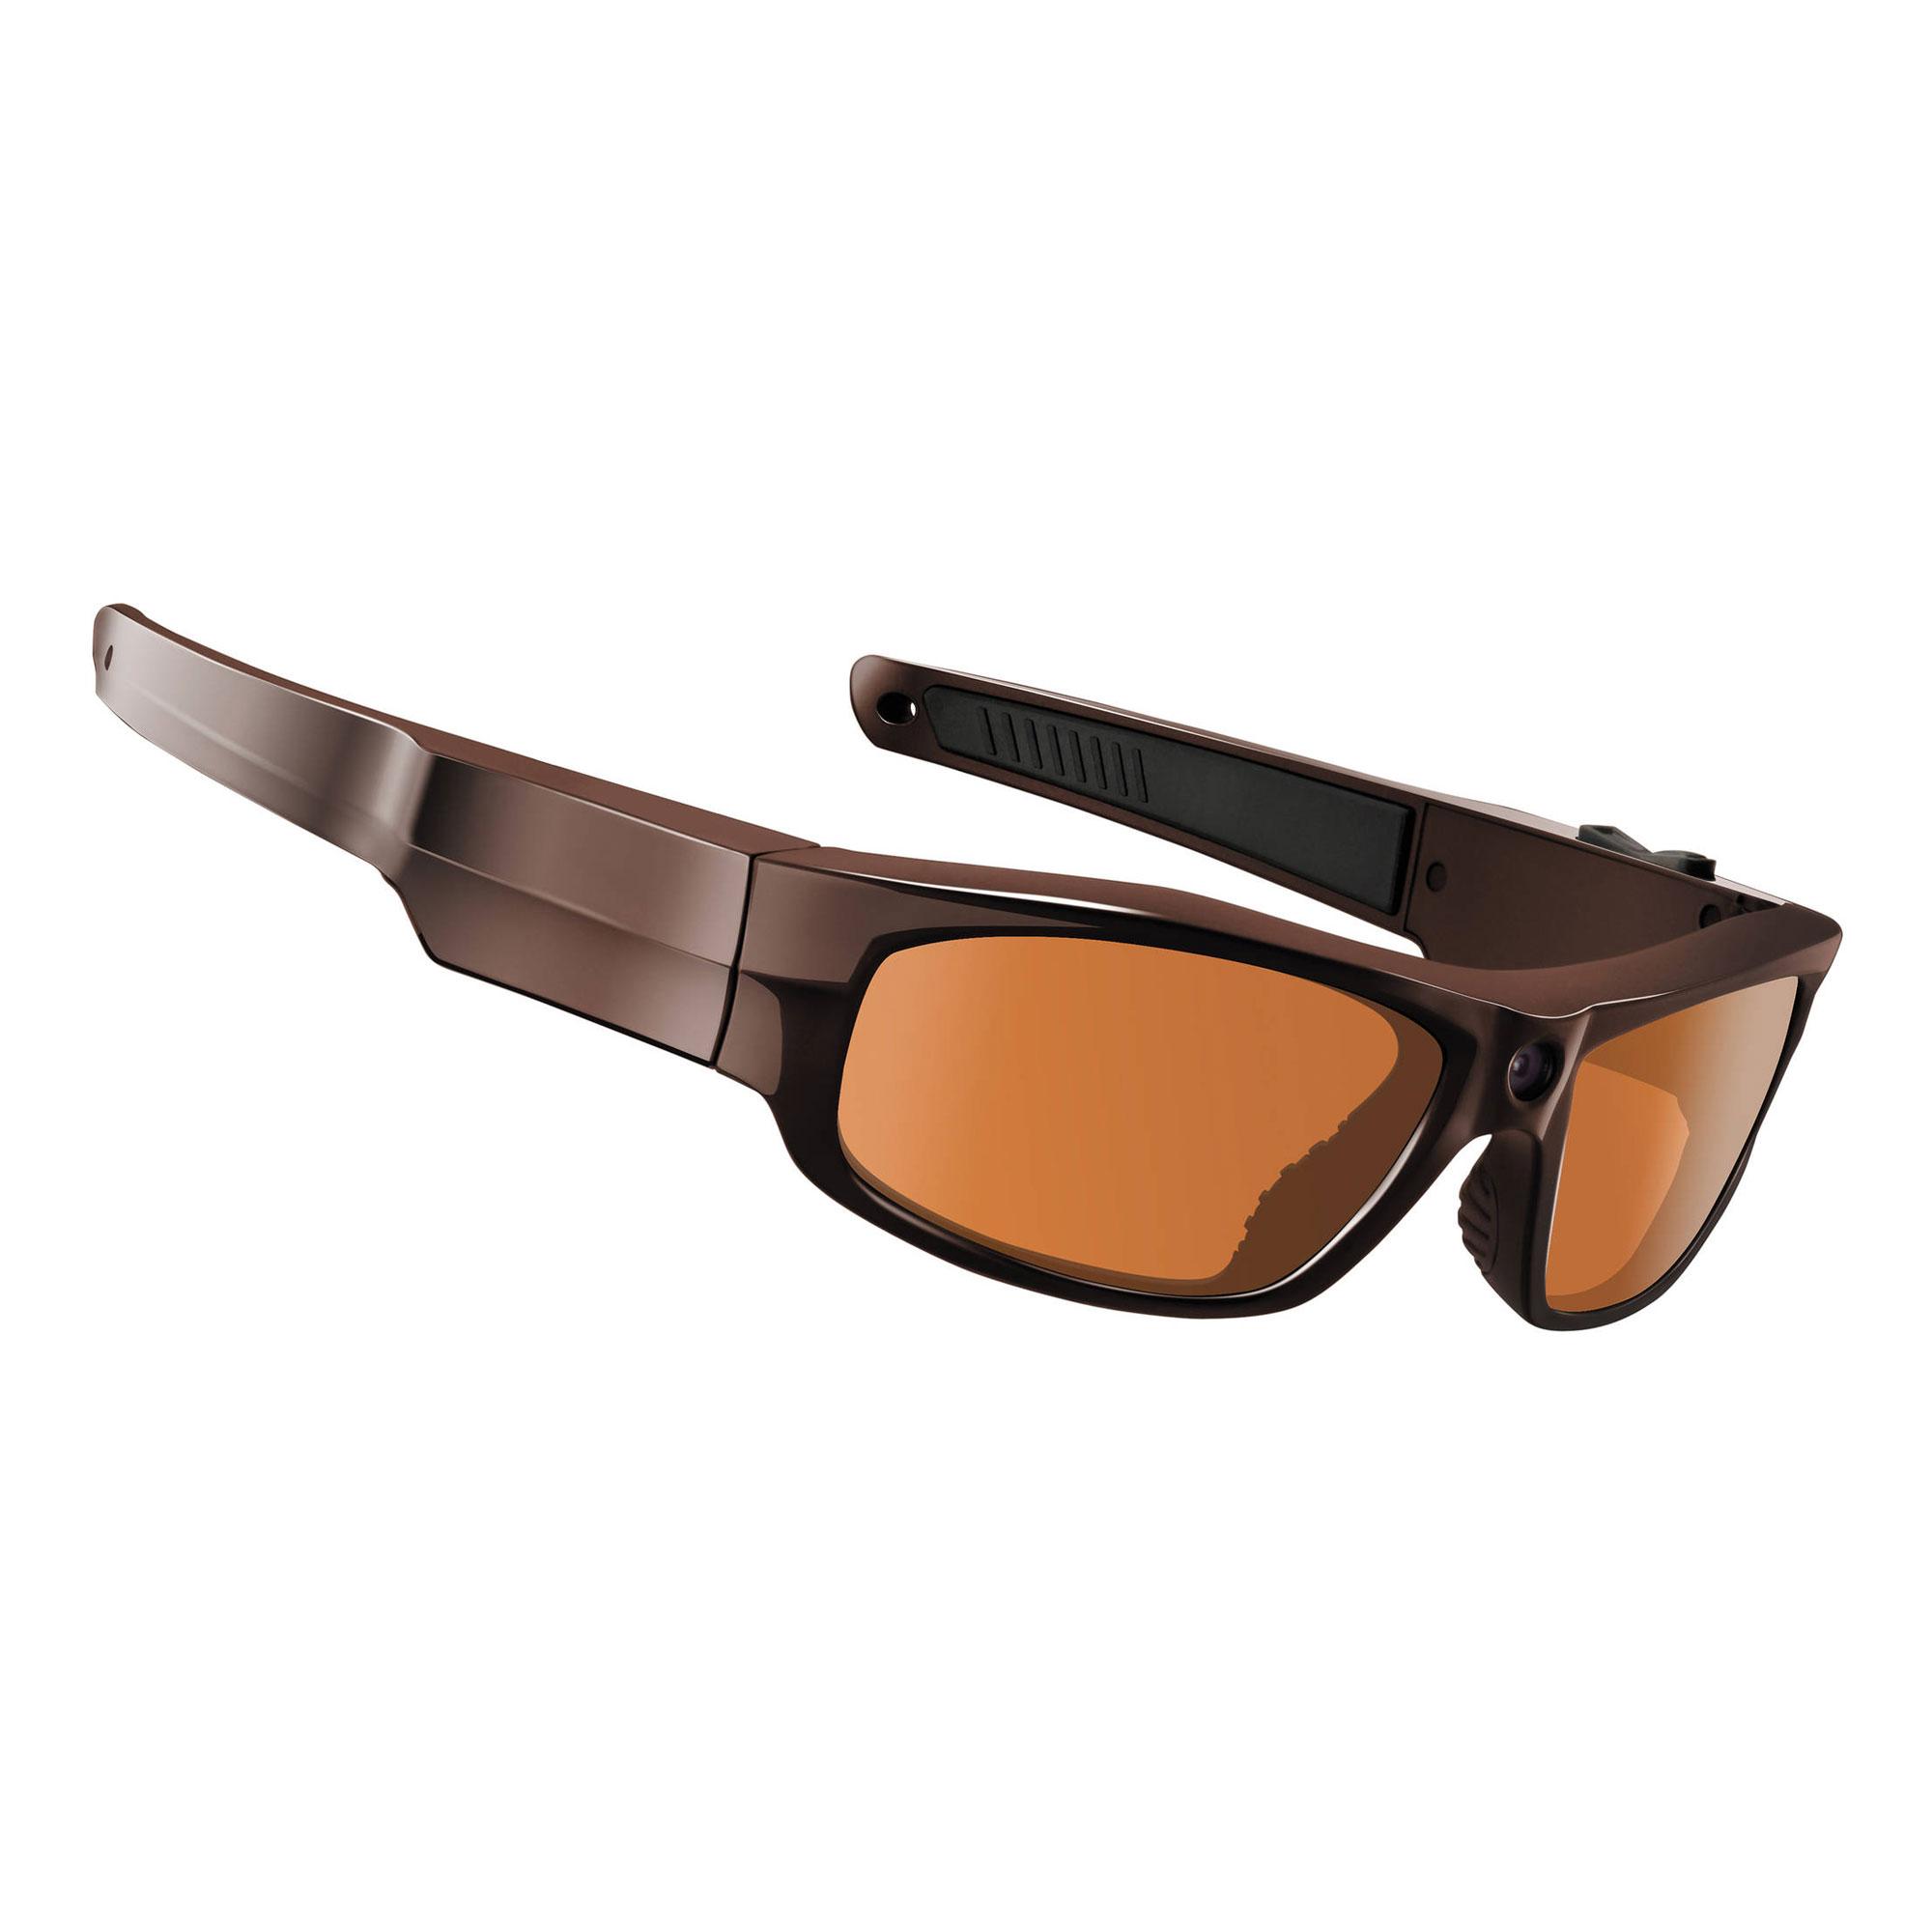 Durango Bronze 1080p Video Recording Sunglasses